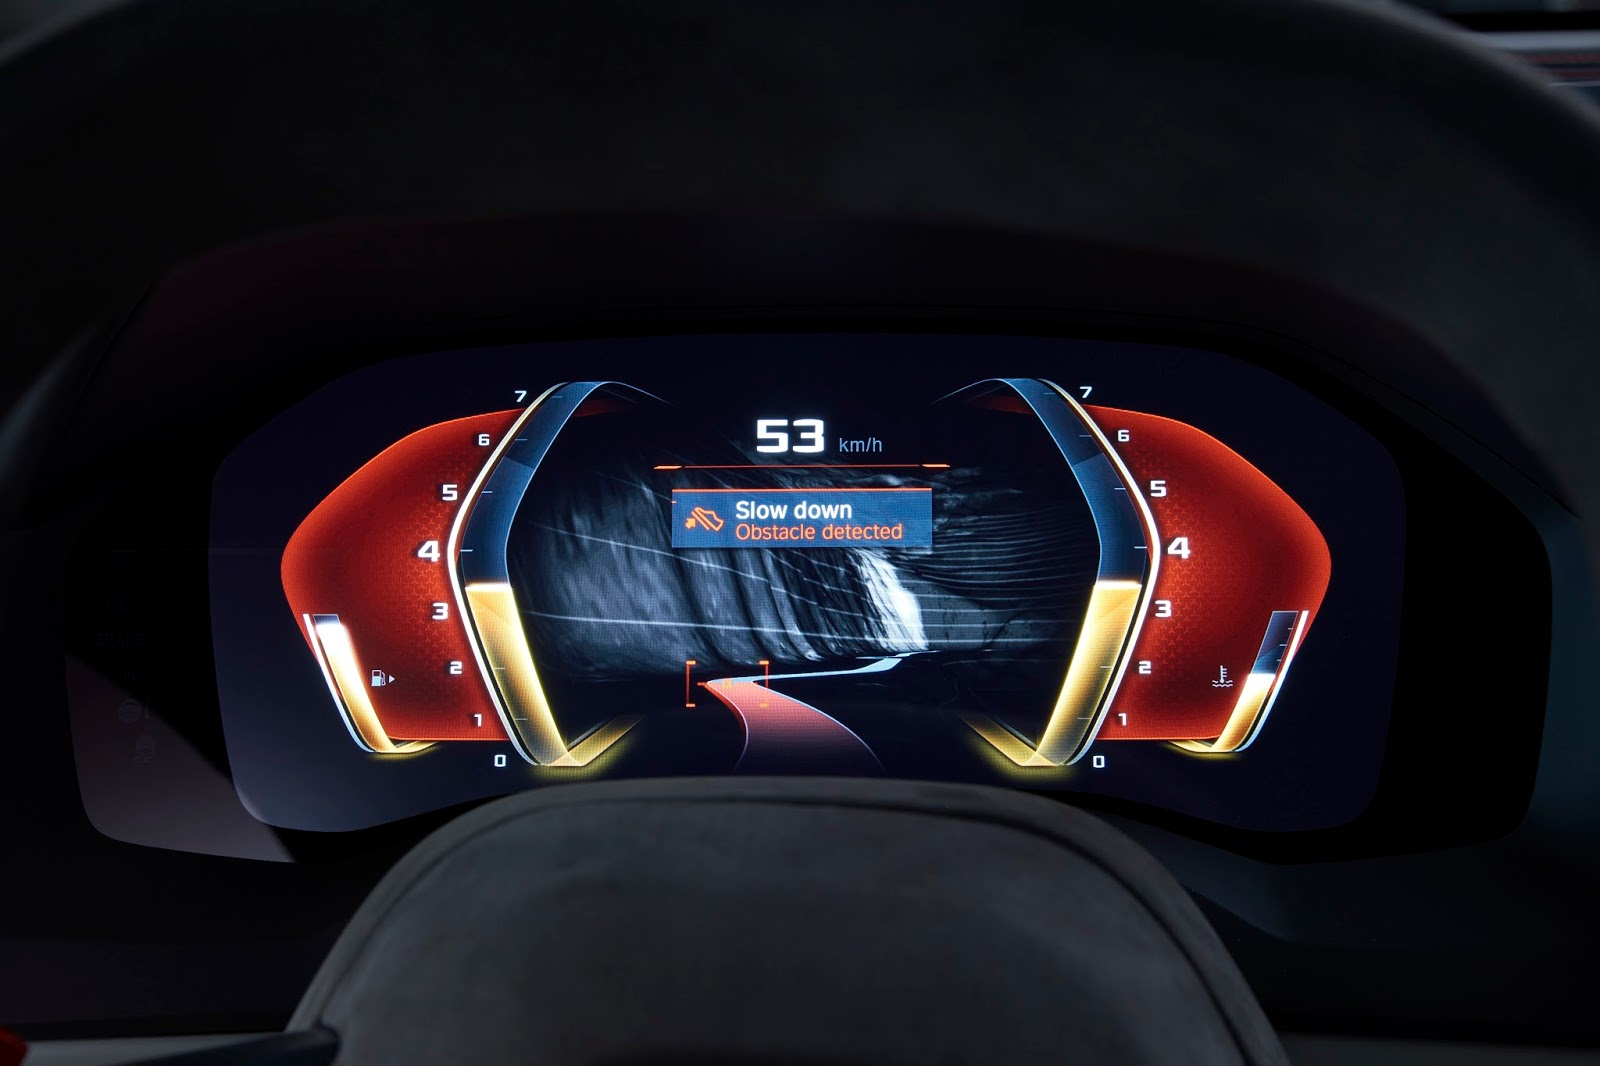 P90261141 highRes bmw concept 8 series Η BMW Σειρά 8 Coupe είναι η πεμπτουσία των μελλοντικών σπορ αυτοκινήτων BMW, BMW 8, BMW Concept, BMW Concept 8 Series, COUPE, dream car